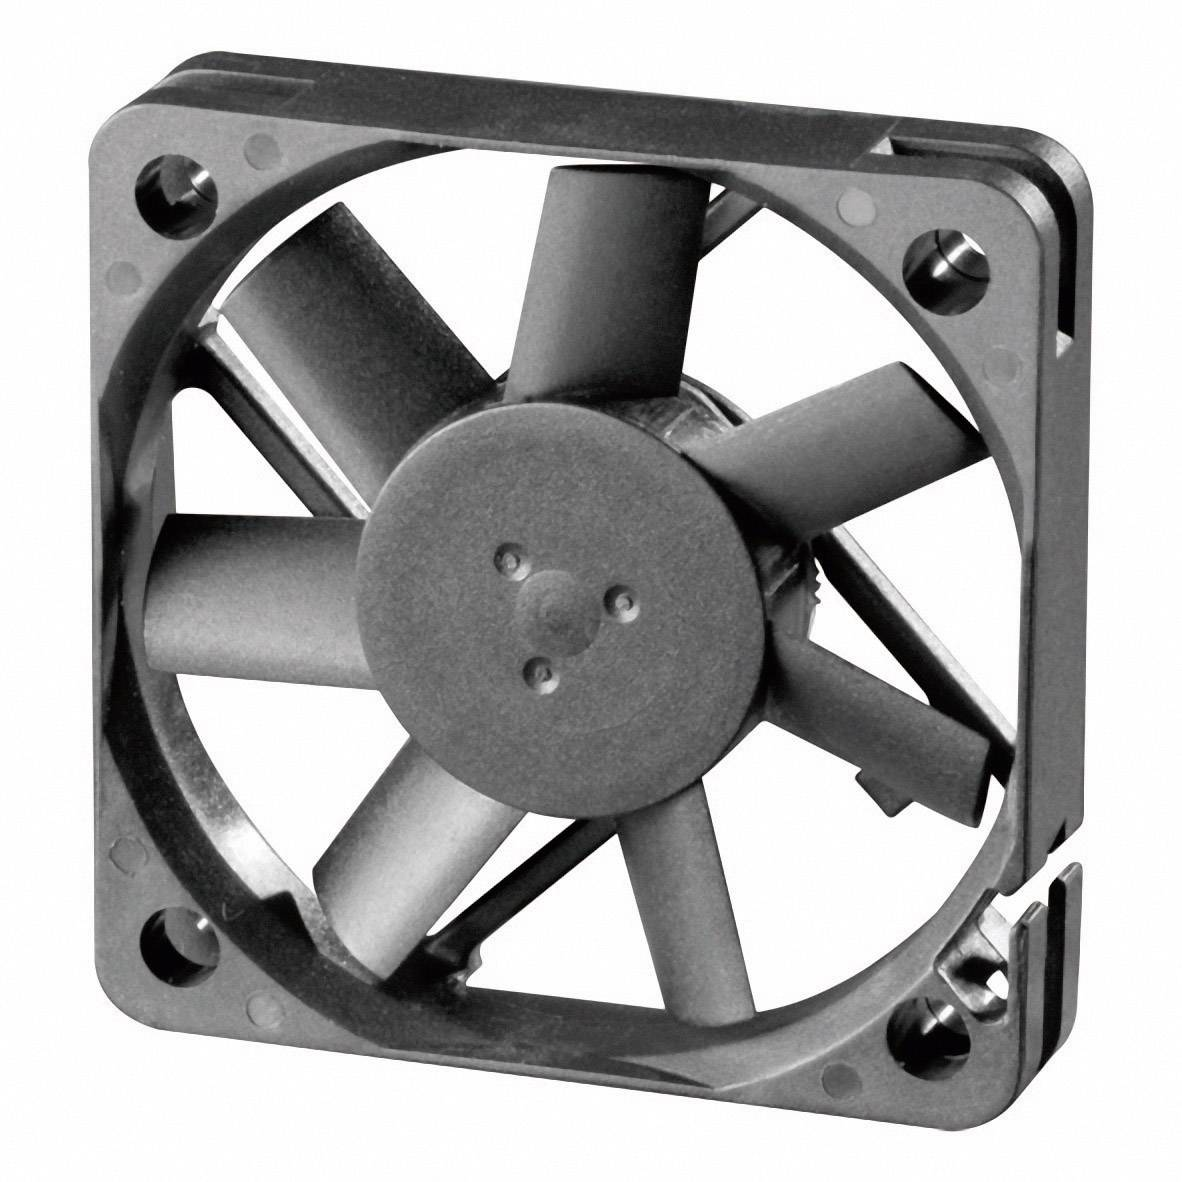 Ventilátor Sunon DR EB60251S1-000U-999, 60 x 60 x 25 mm, 12 V/DC